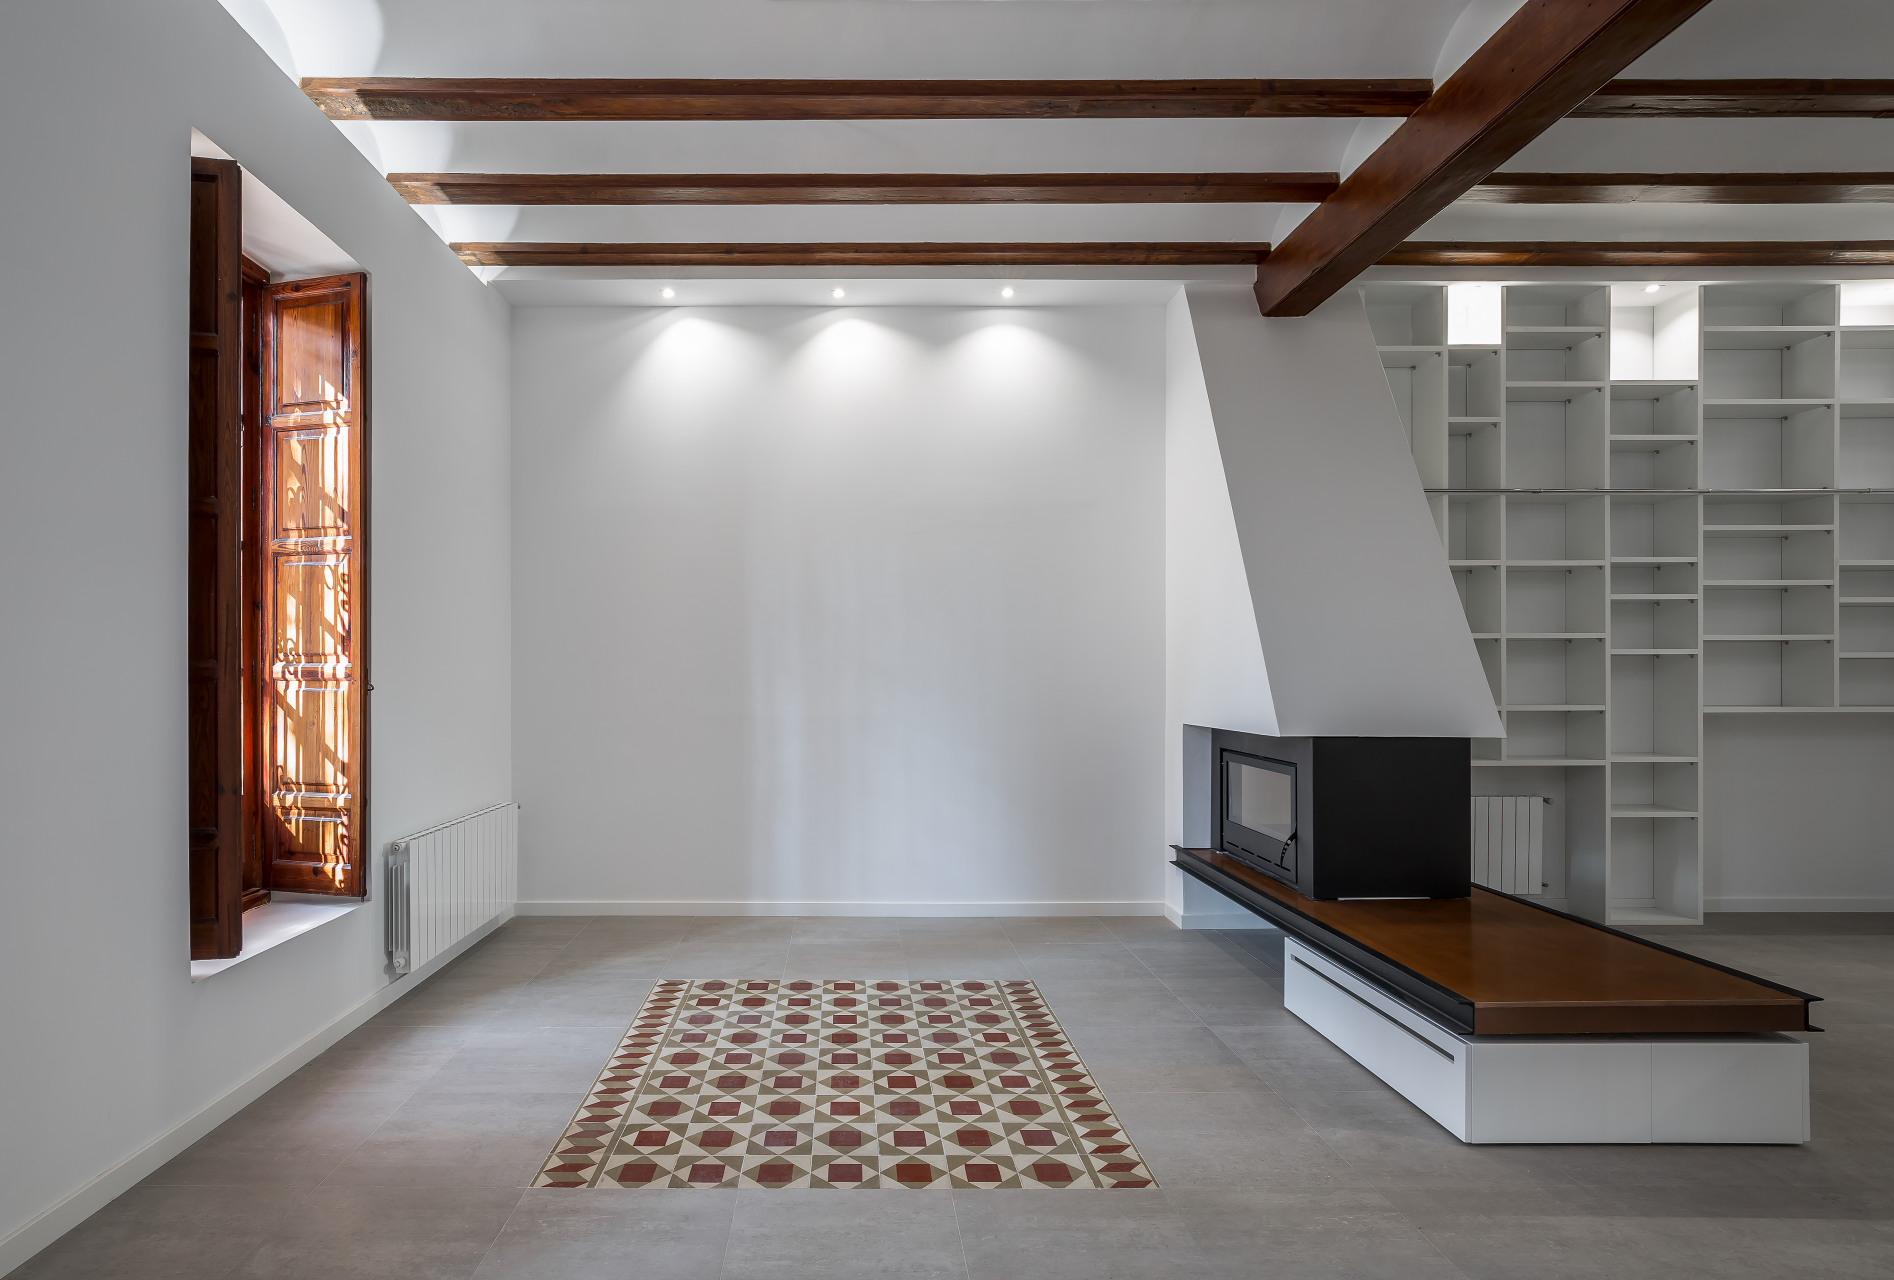 fotografia-arquitectura-valencia-german-cabo-viraje-rehabilitacion-campanar (3)